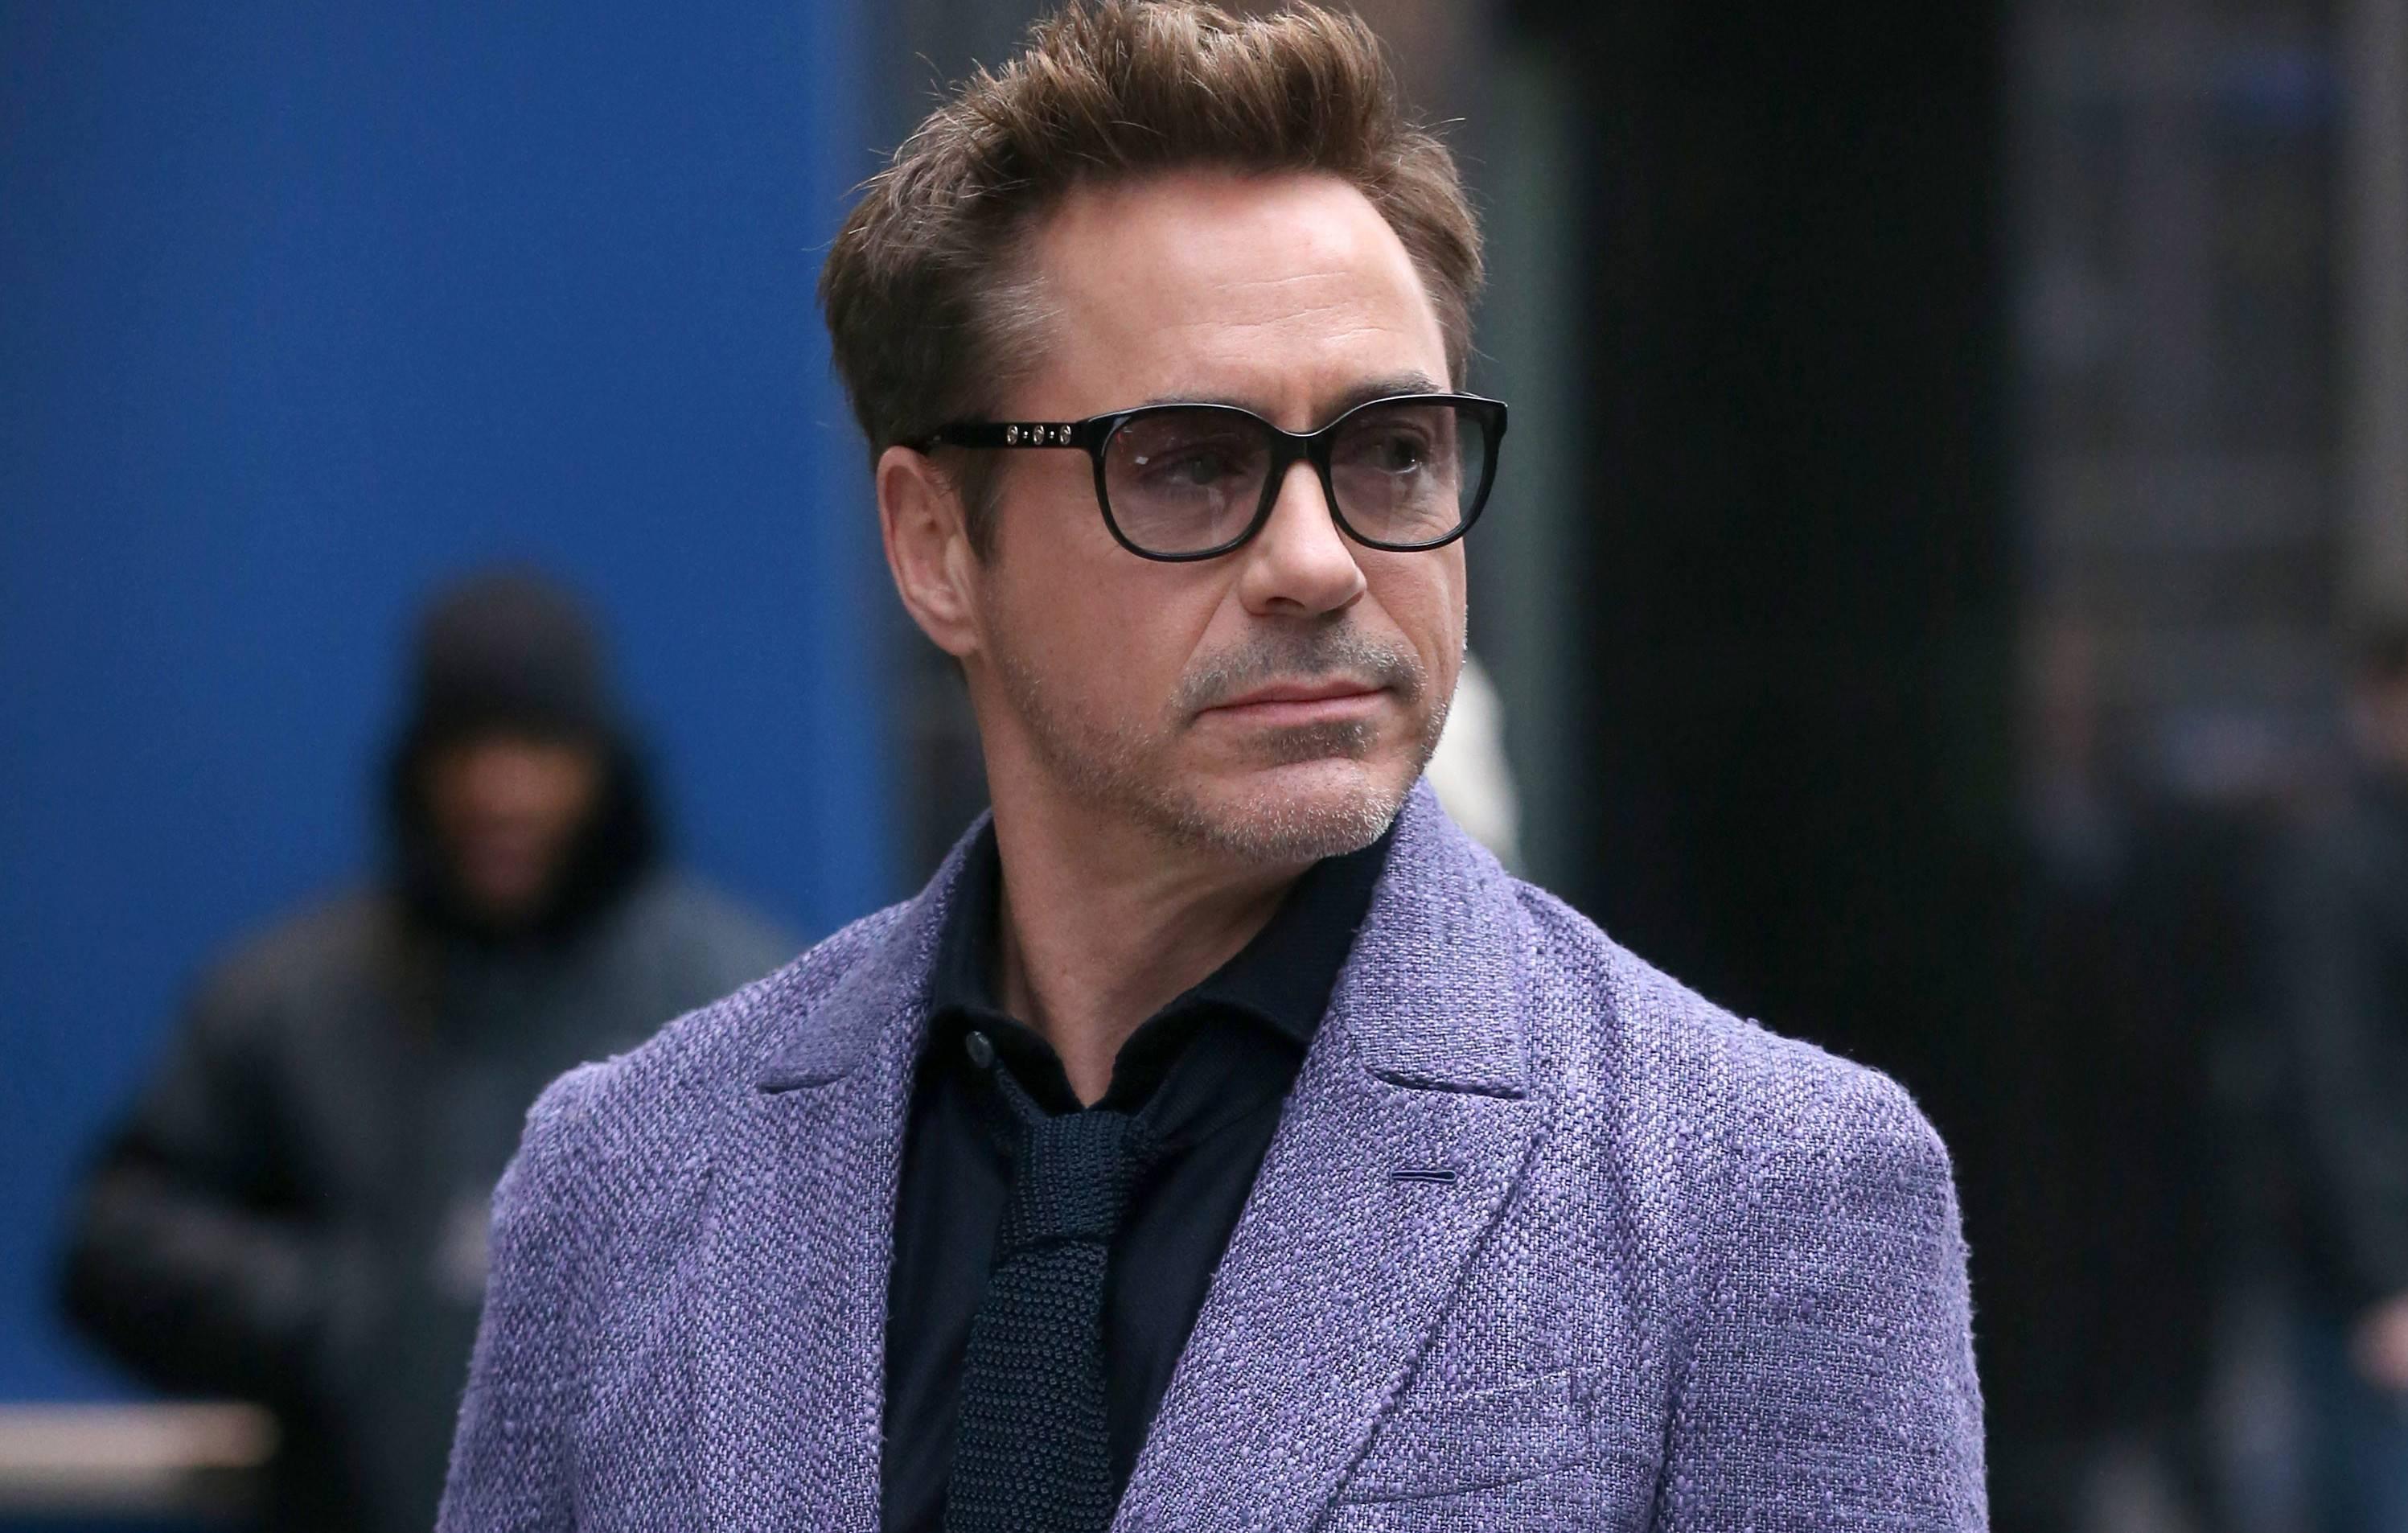 Robert Downey Jr. Parents